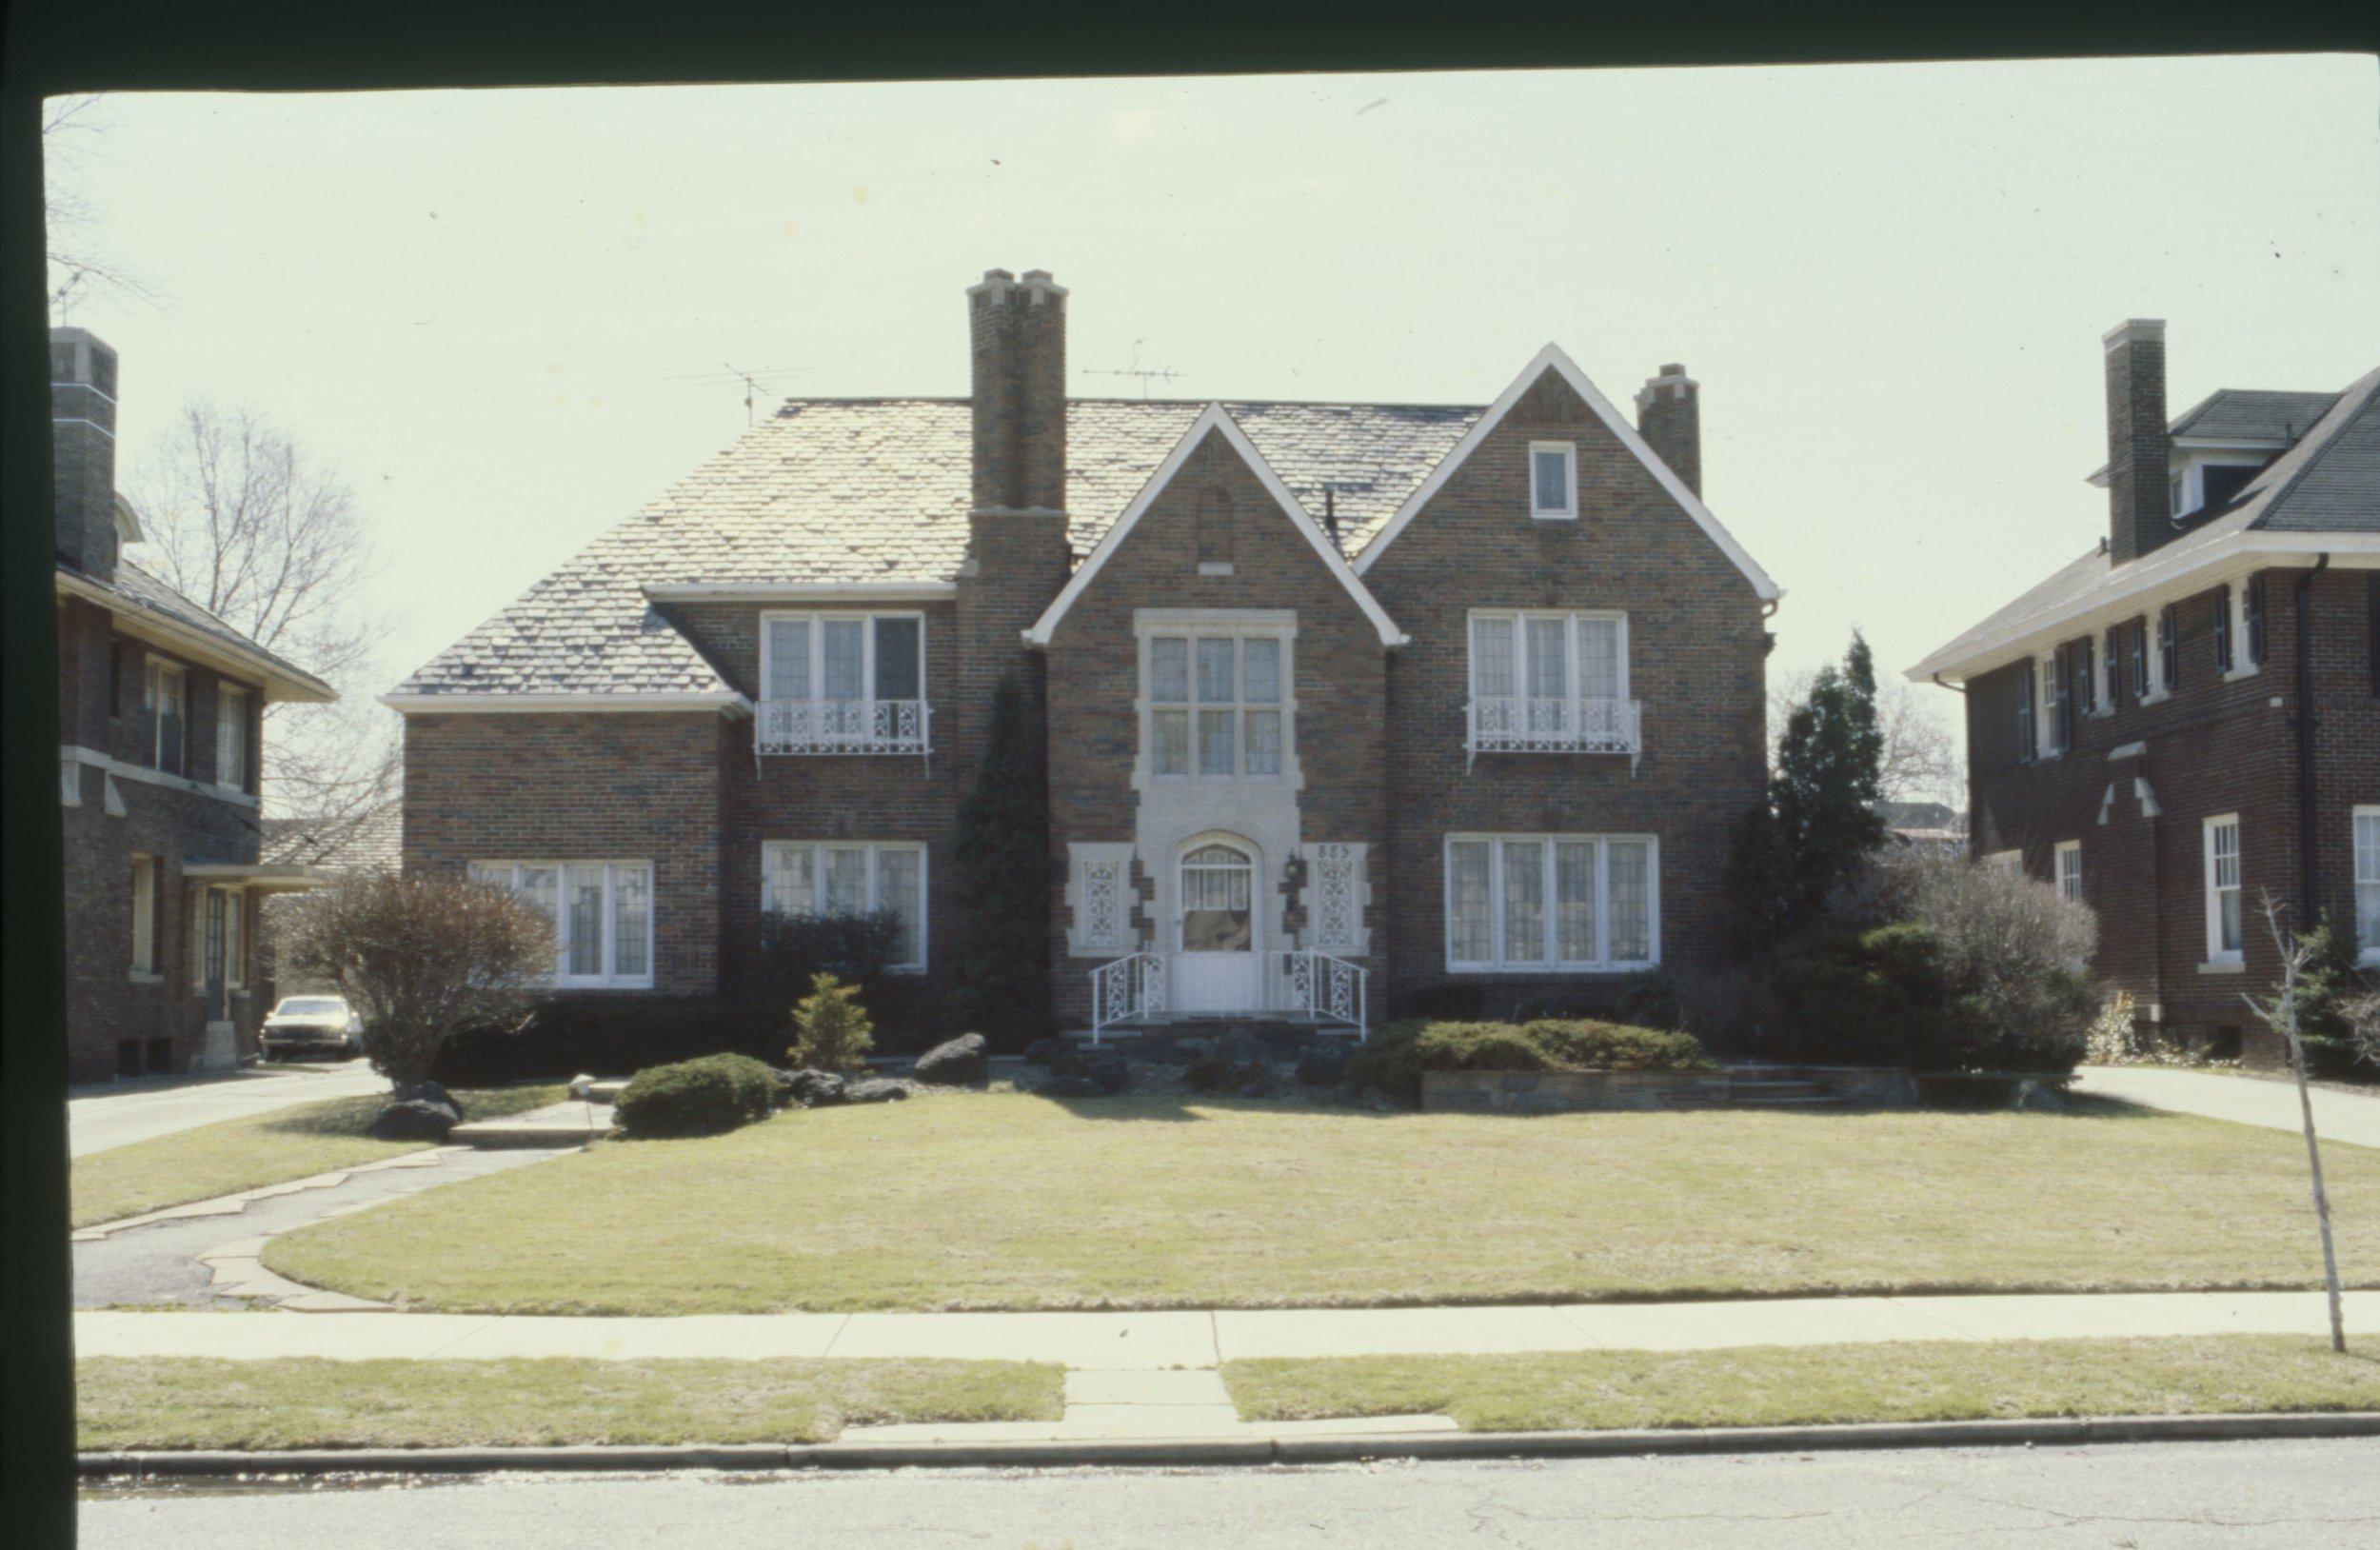 885 W. Boston 1980.jpg